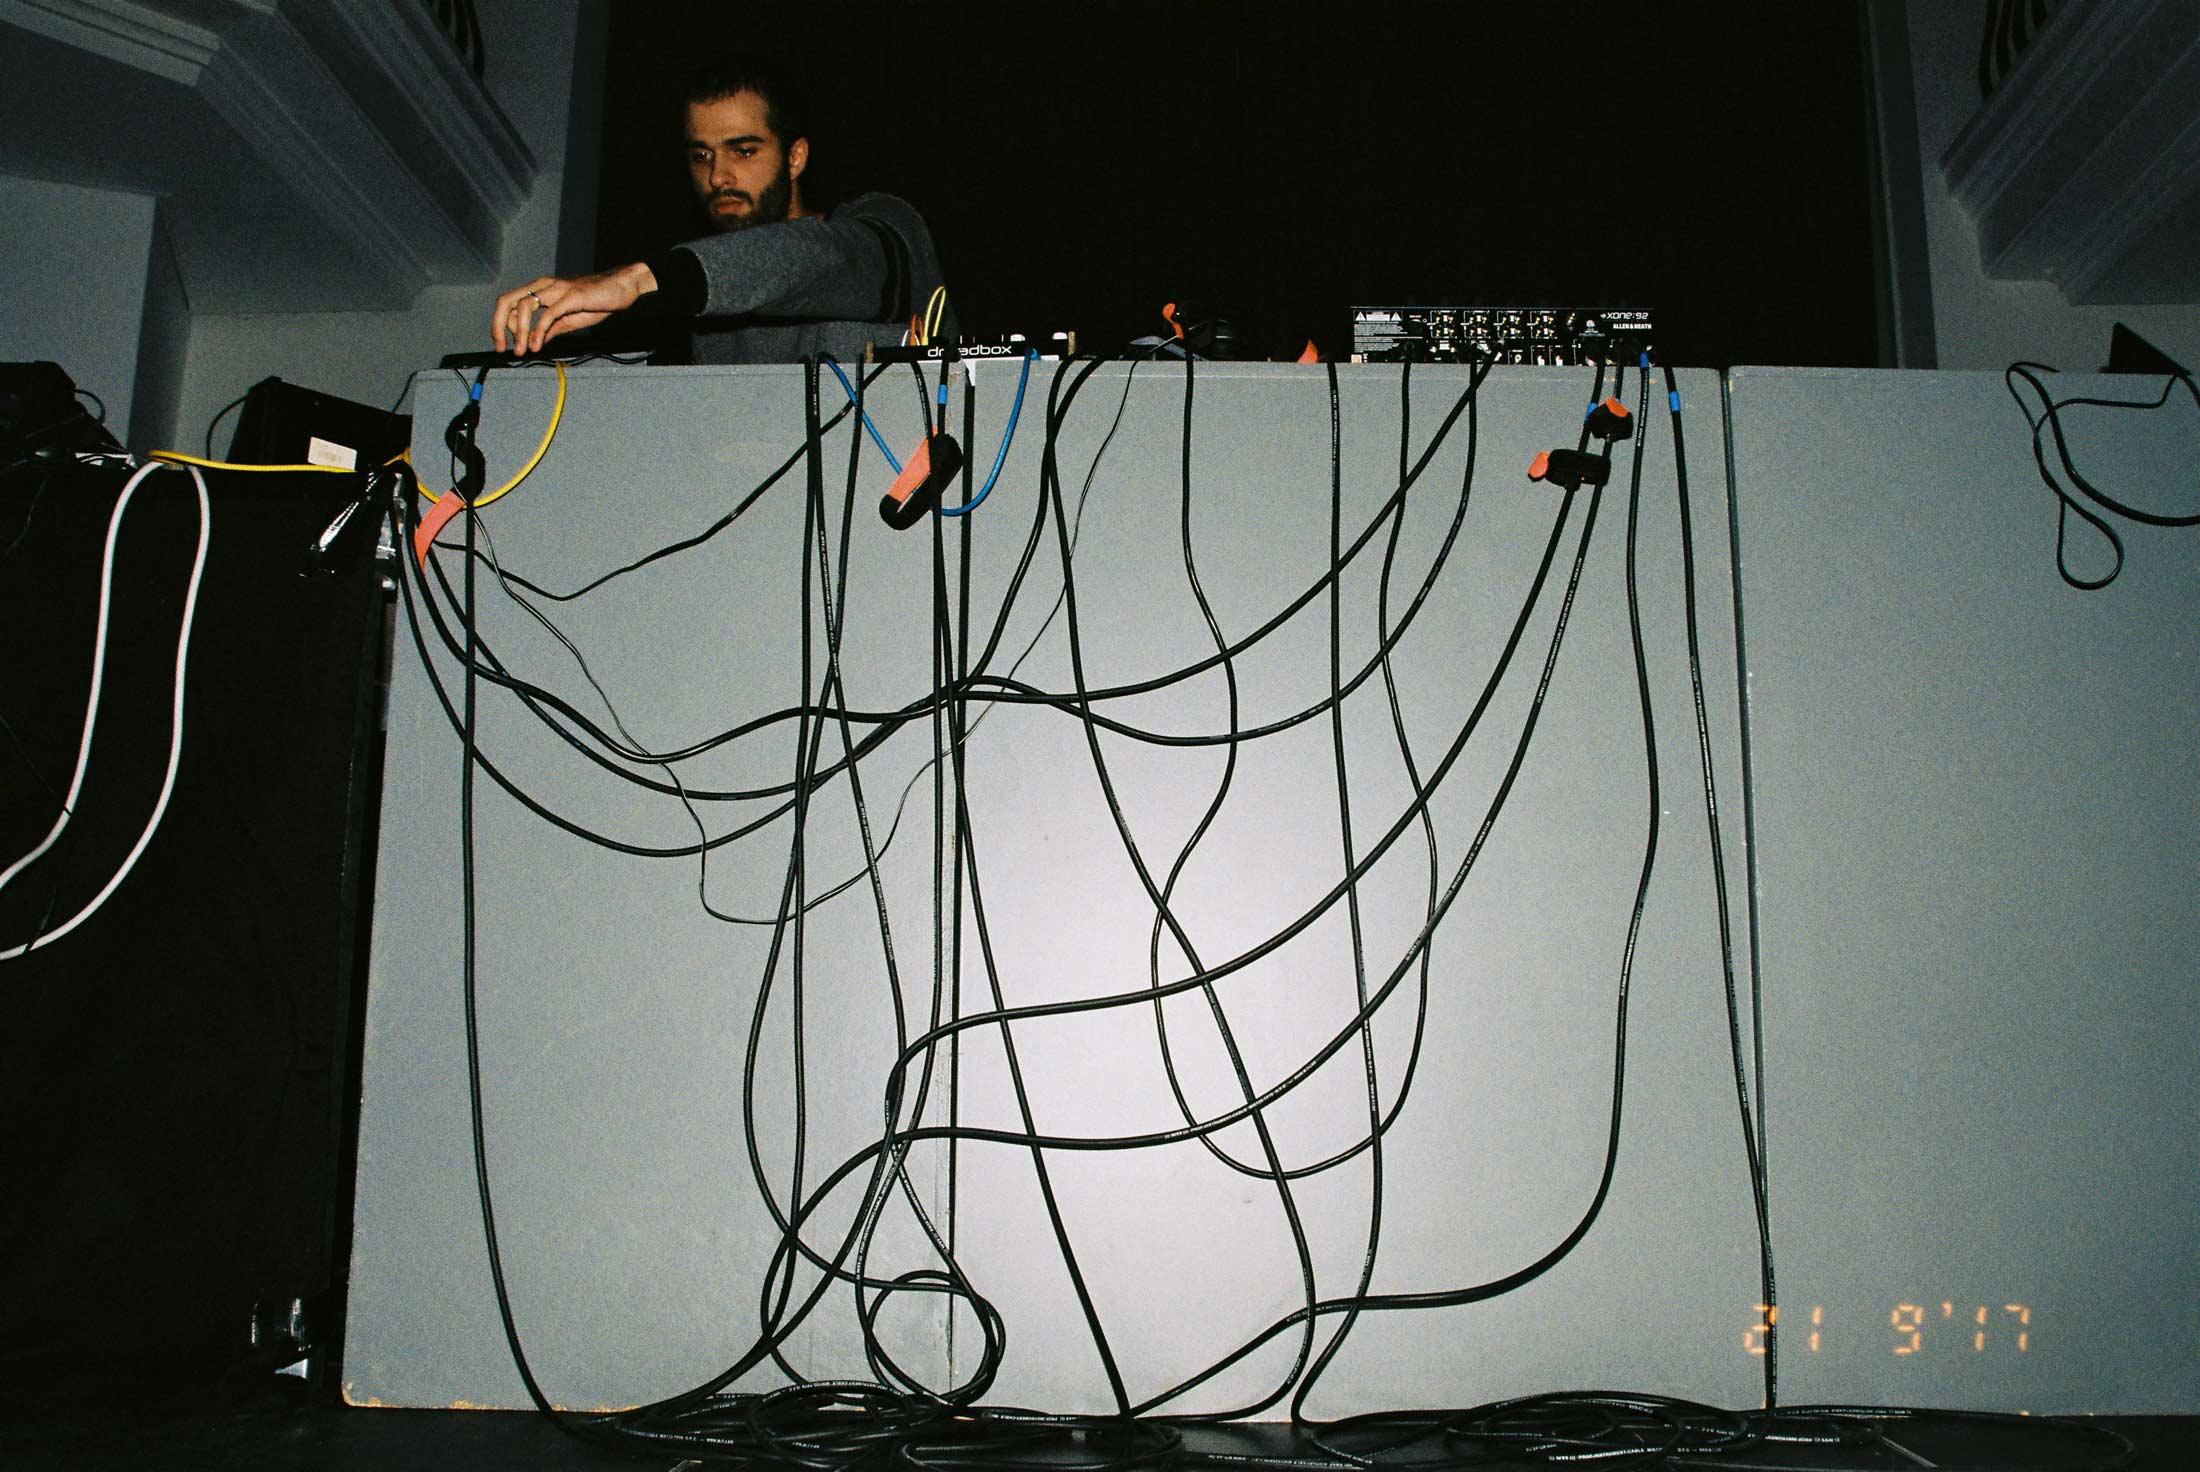 Zesknel Berlin Underground Techno Tresor Ohm Rave Nightlife